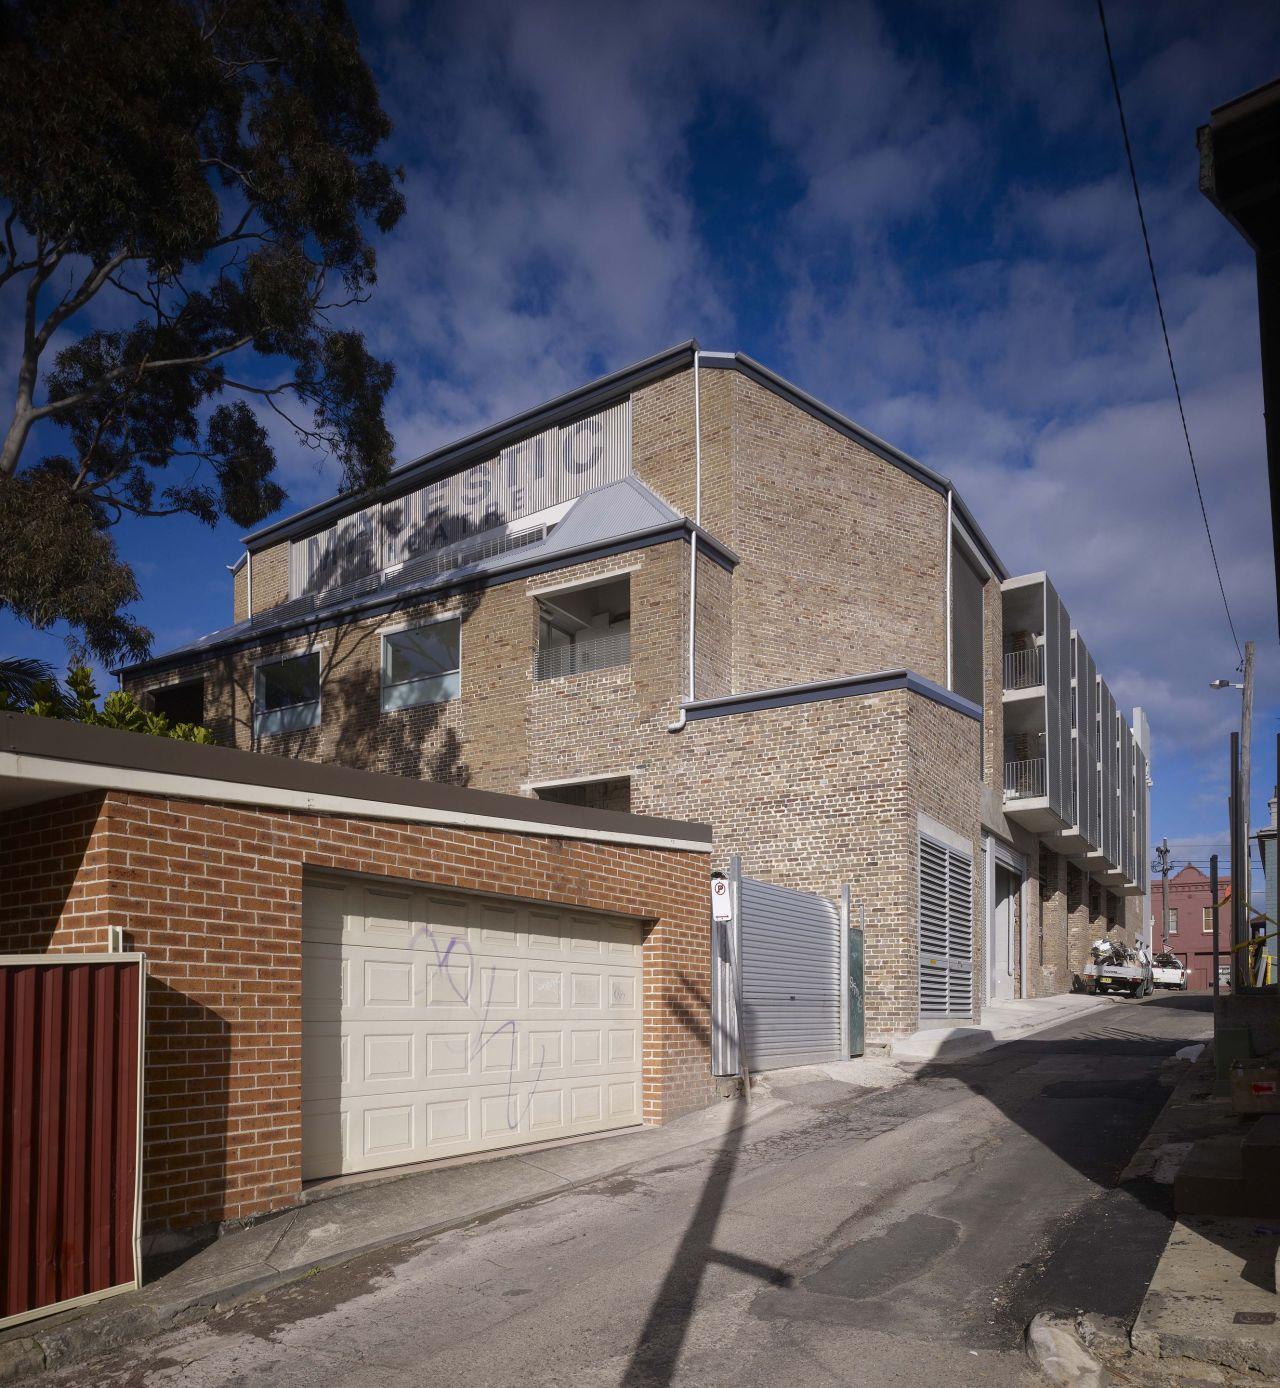 Majestic Theatre Apartments / Hill Thalis Architecture